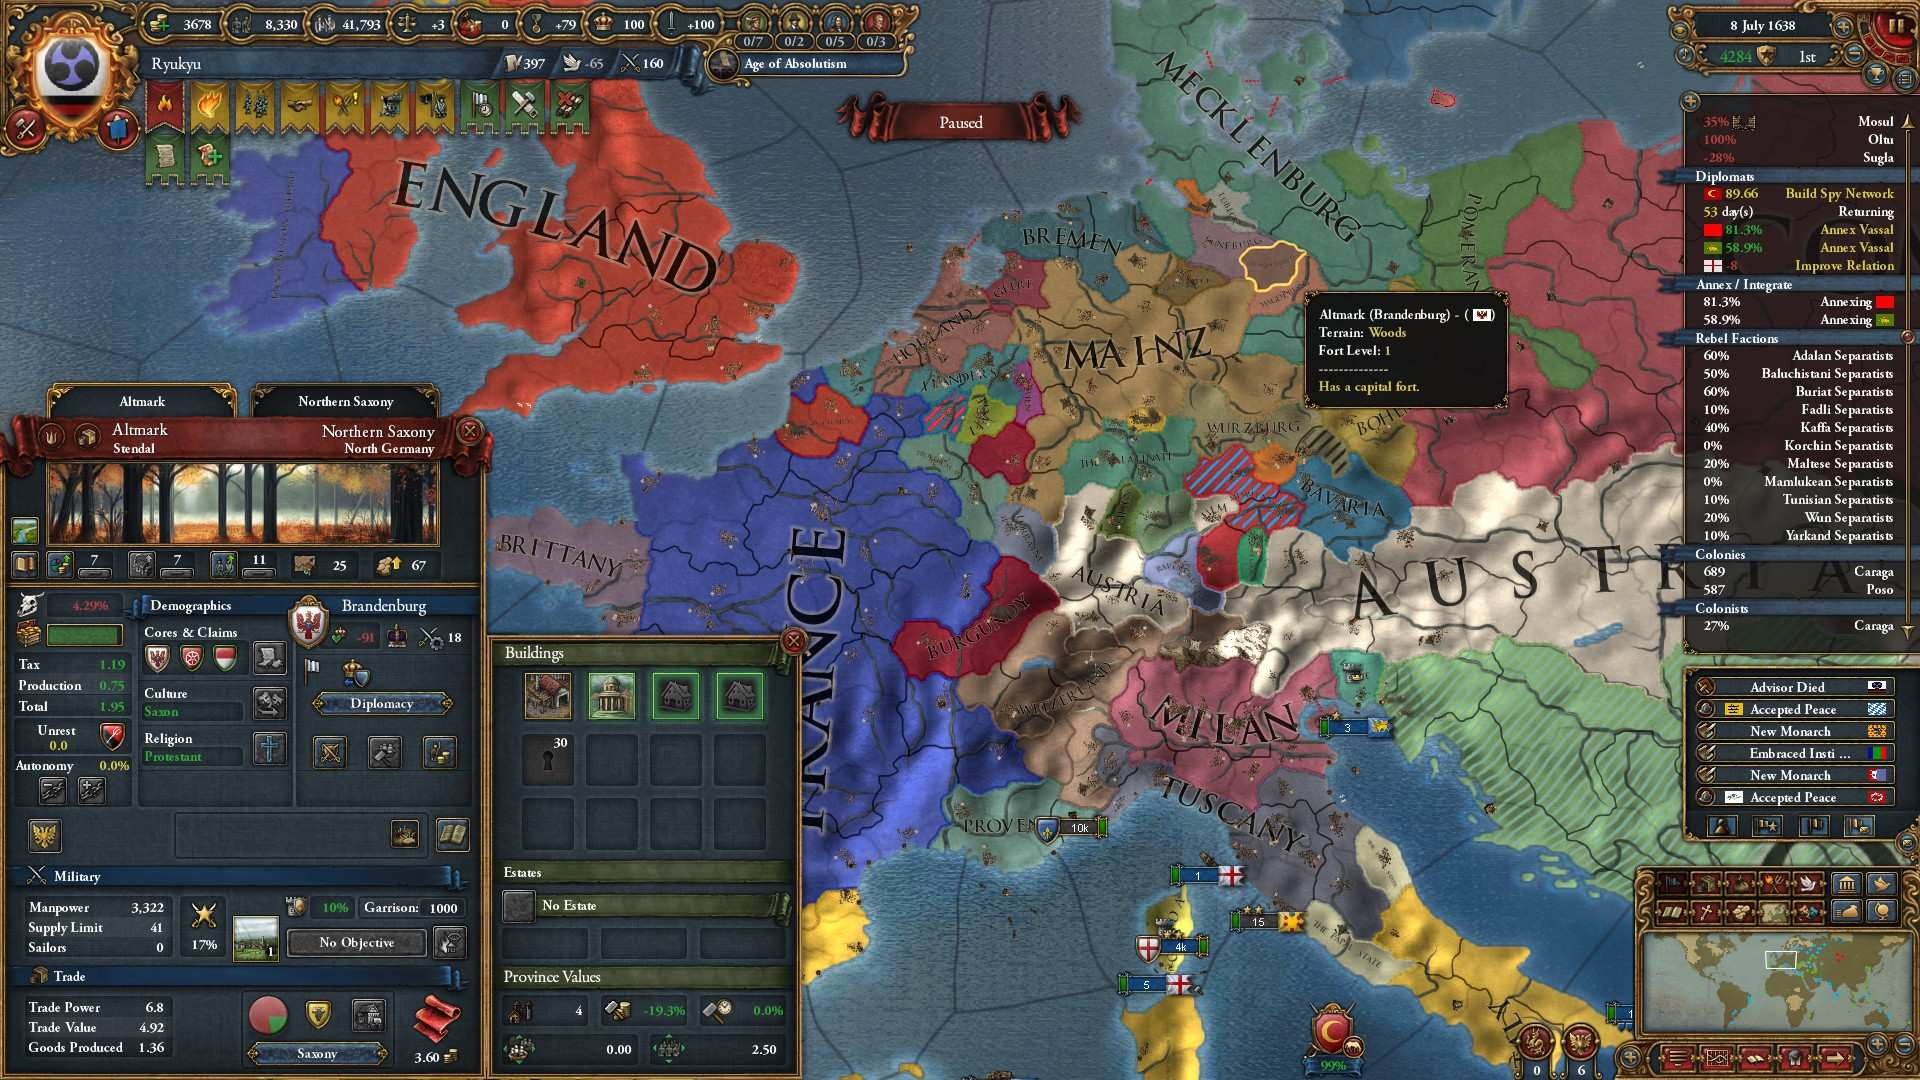 Europa Universalis IV - How to Get the Three Mountains Achievement